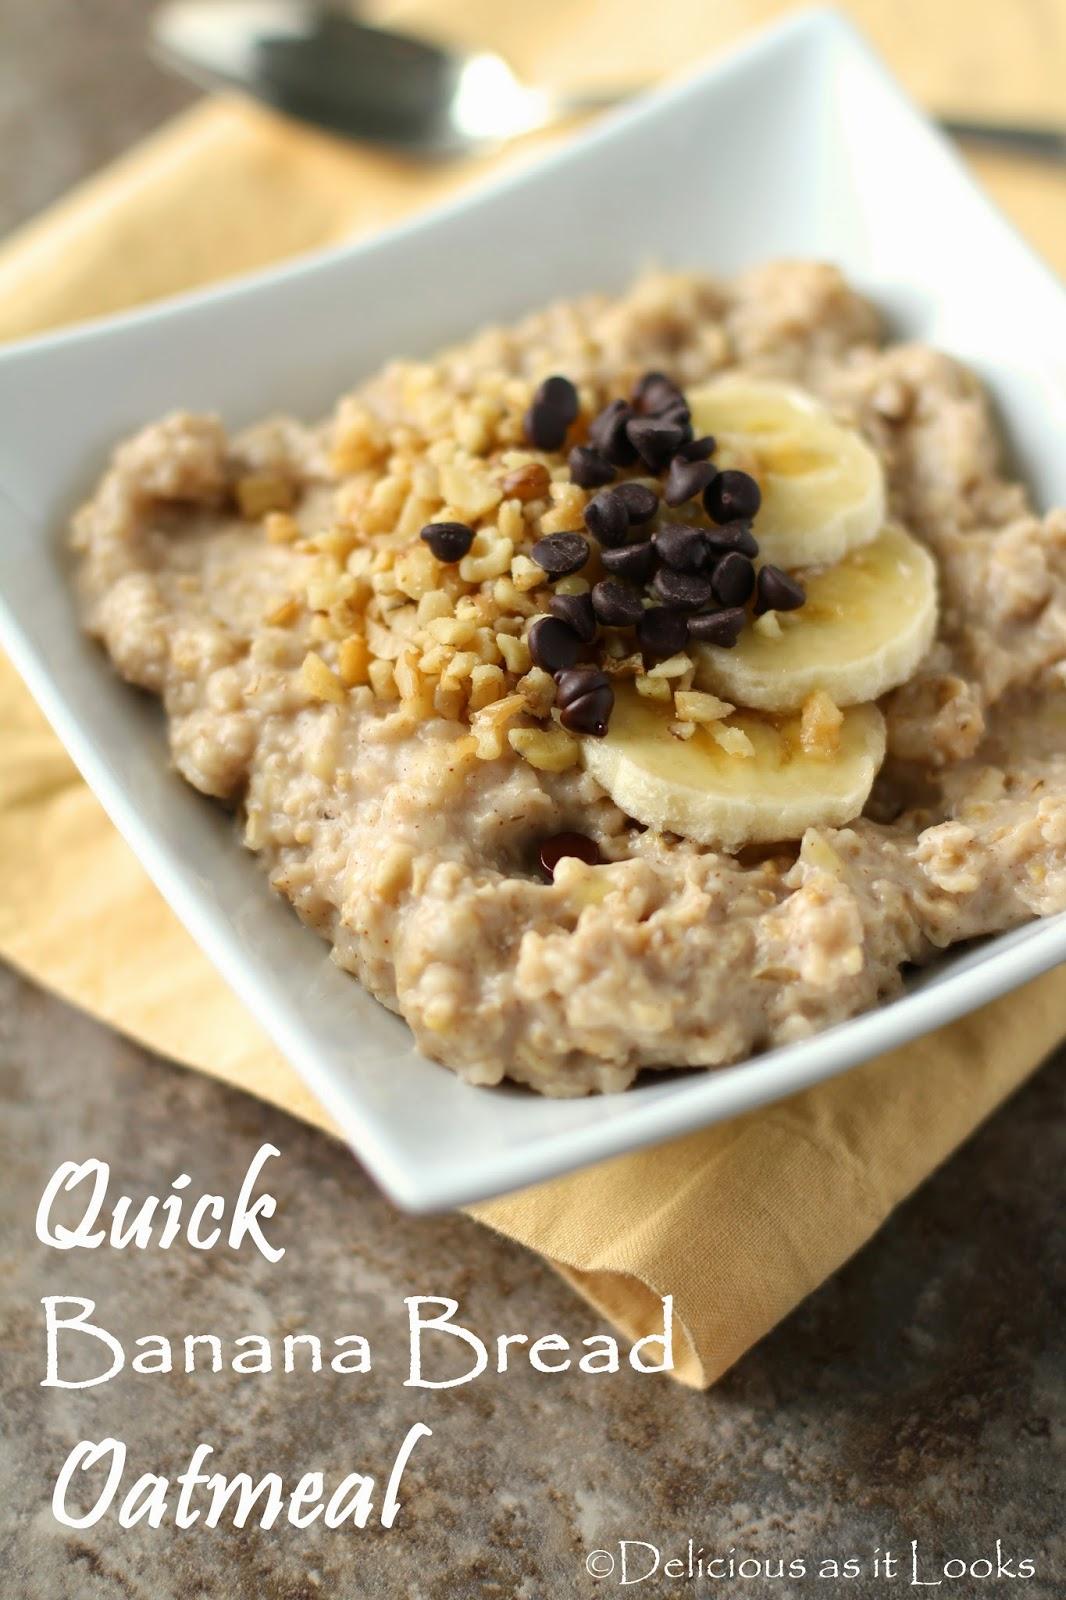 Quick Banana Bread Oatmeal {Low-FODMAP, Gluten-Free, Dairy-Free, Vegan}  /  Delicious as it Looks